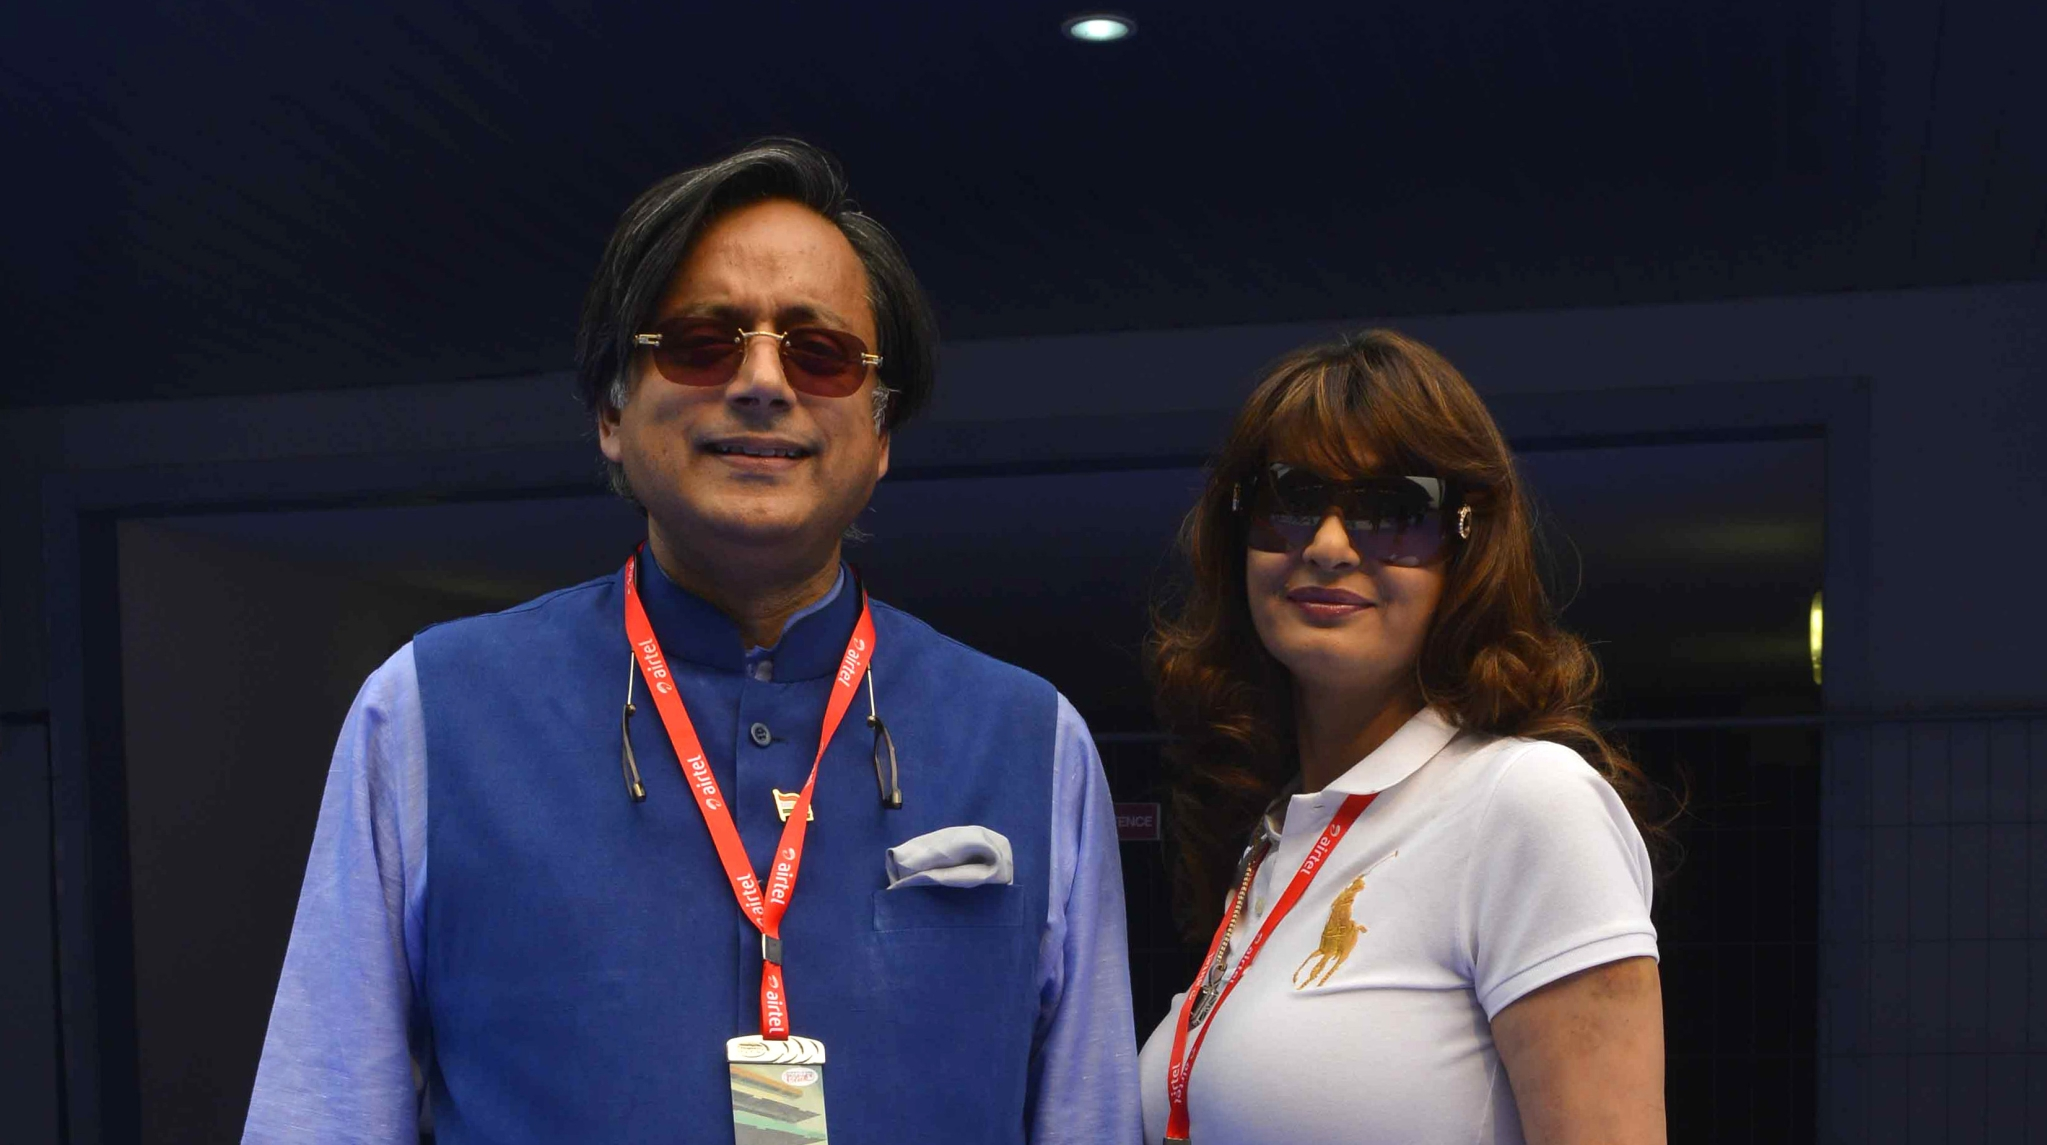 Sunanda pushkar dead photos UNESCO declares Indian National Anthem best in the world